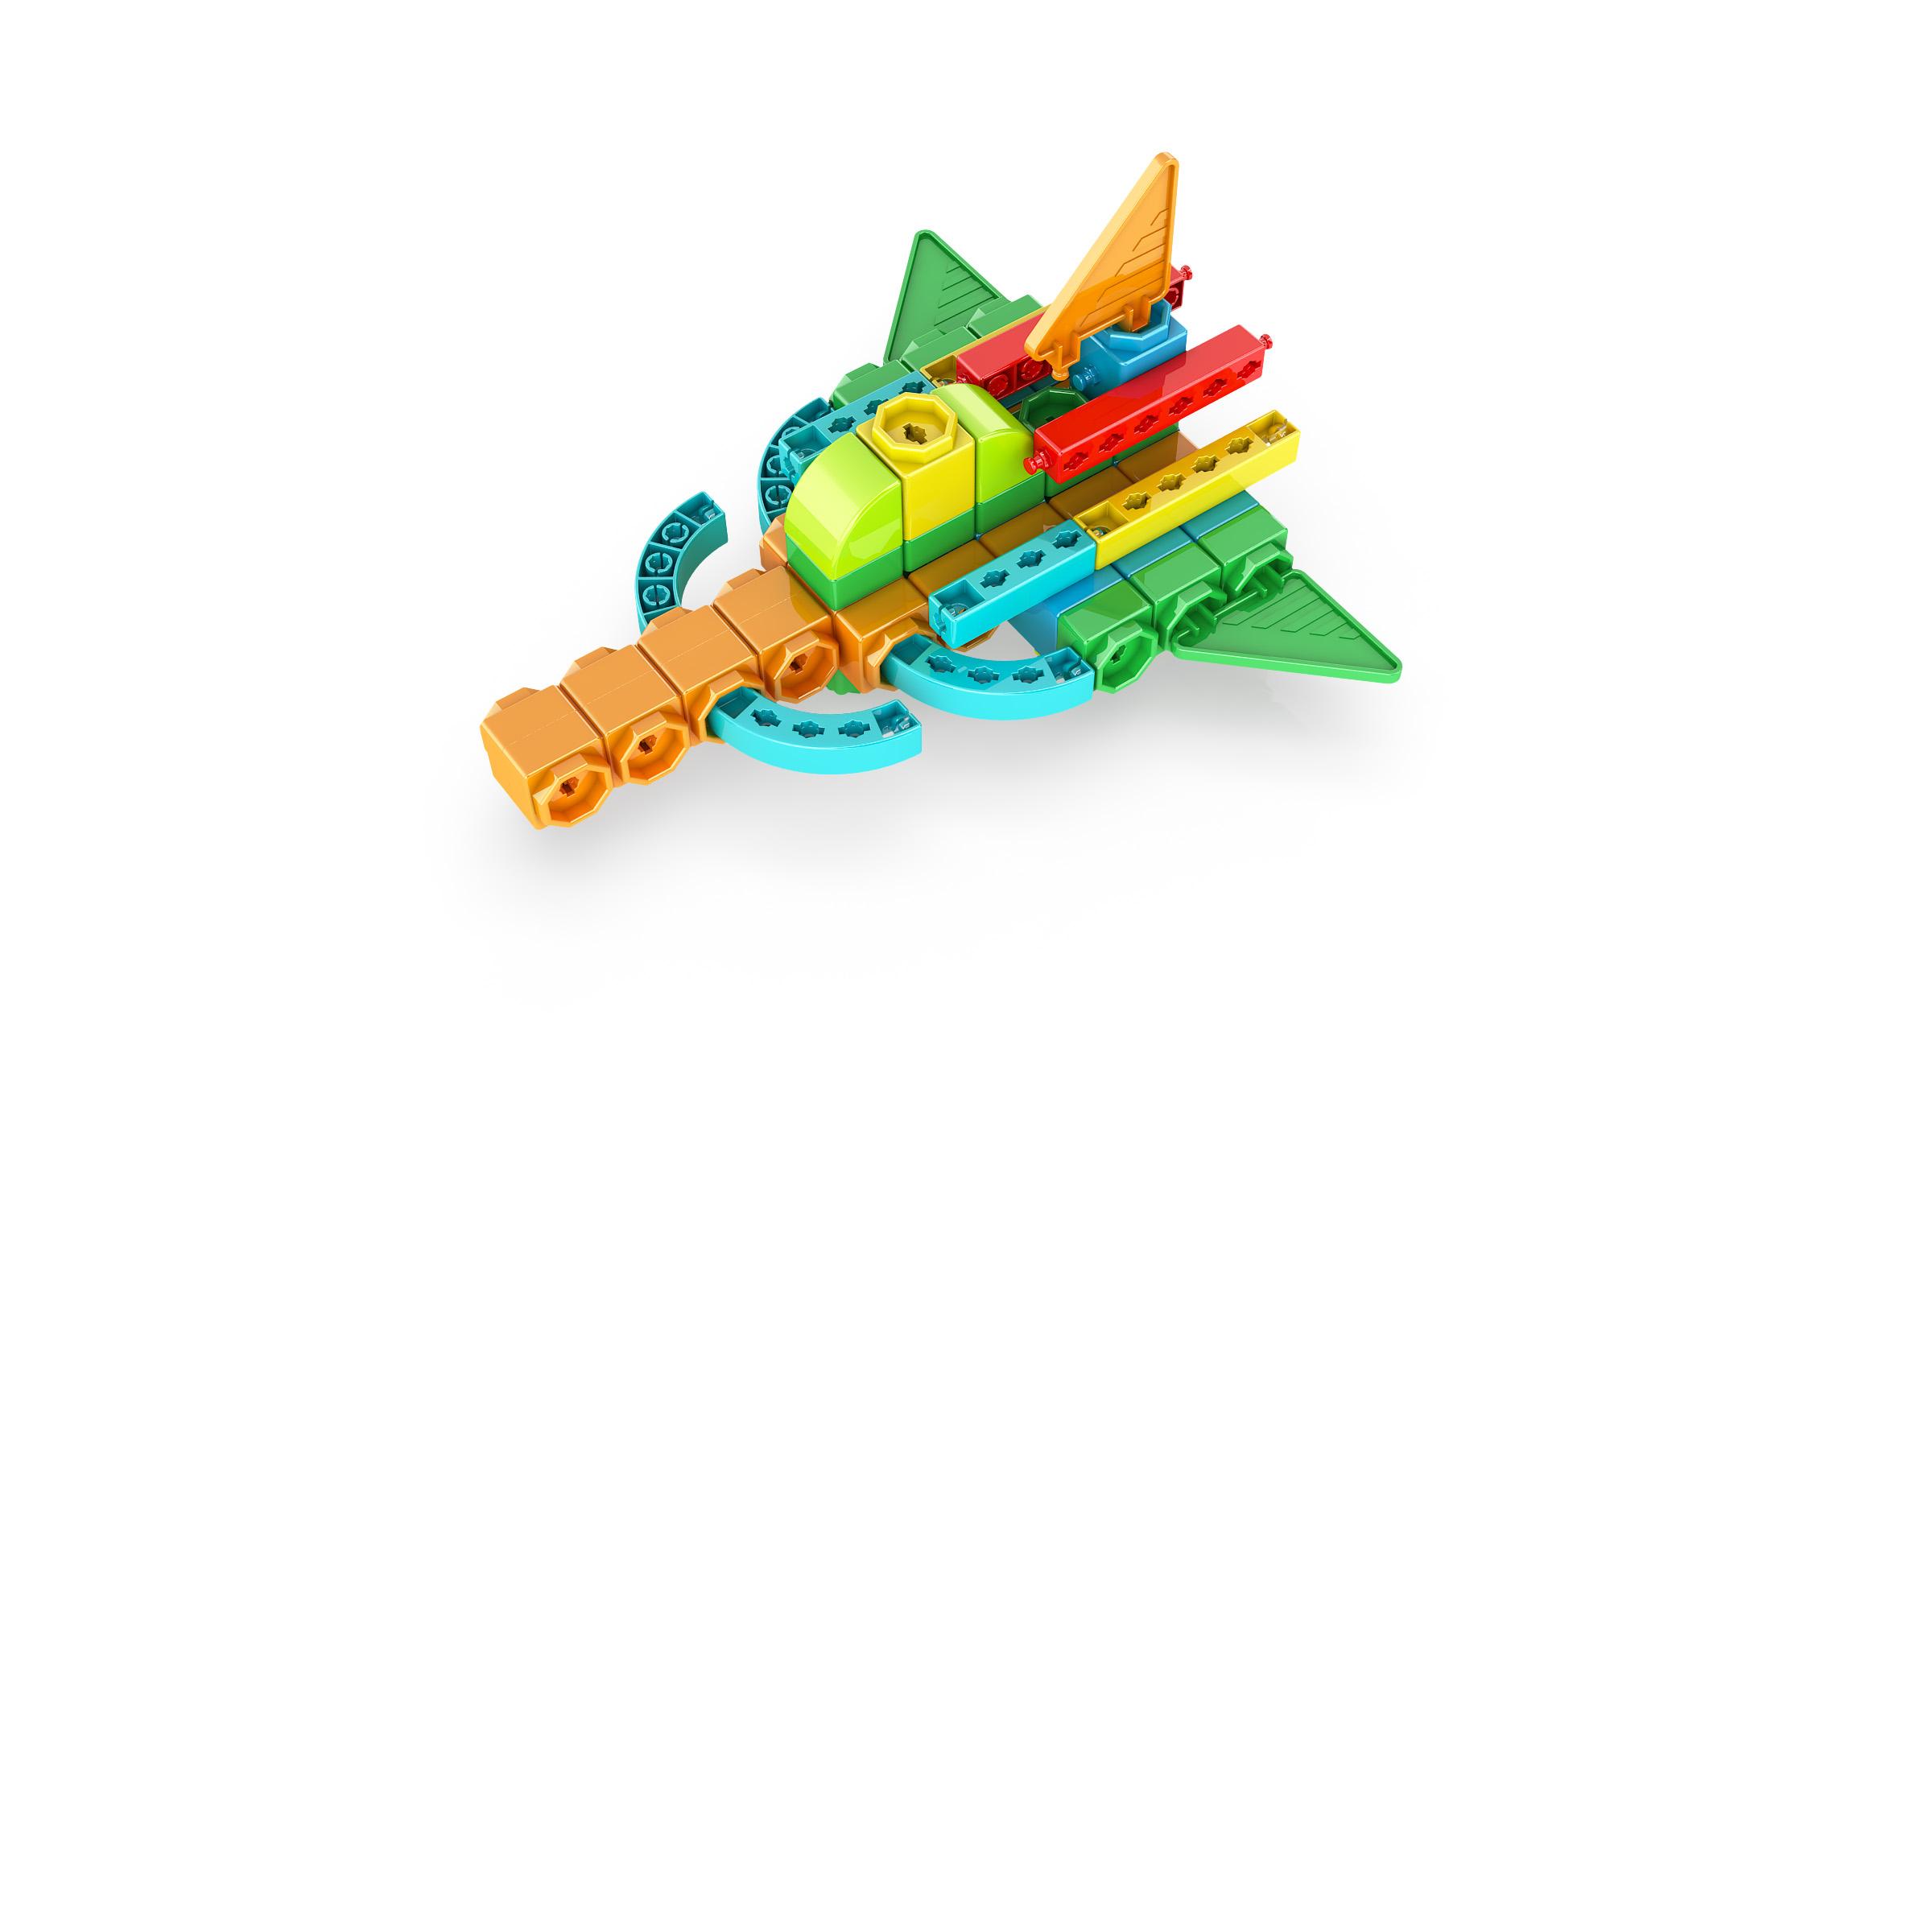 , SpaceShip, משחקים לגיל הרך playgro, משחקי קופסא engino, משחק הרכבות אנג'ינו, משחקי רכבות